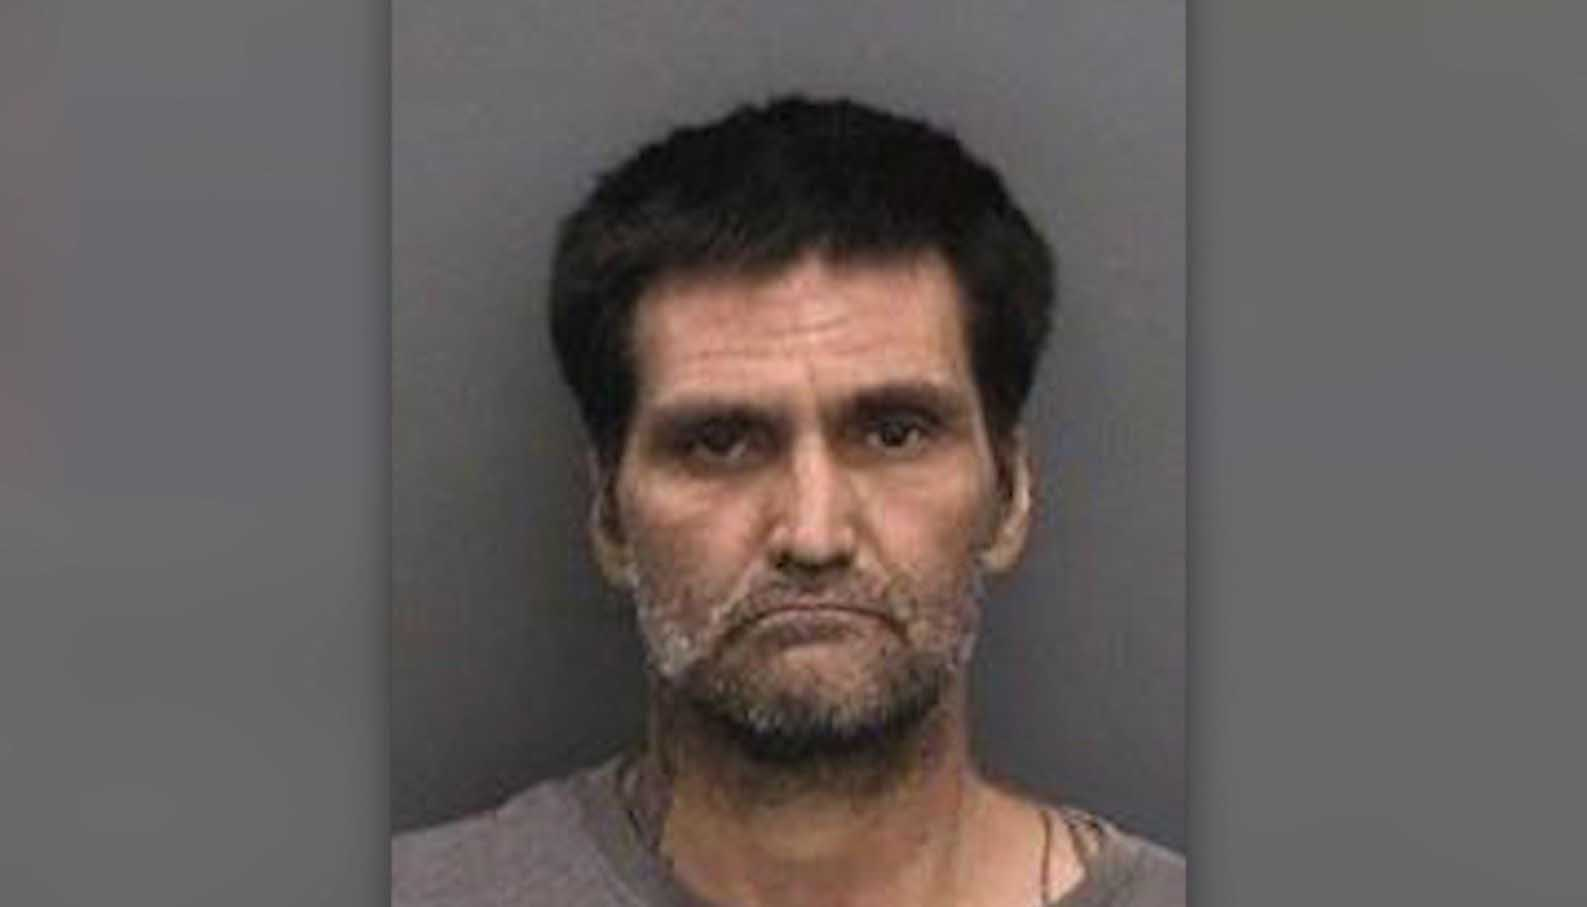 Alberto Obaya (Source: Hillsborough County Sheriff's Office/CNN)